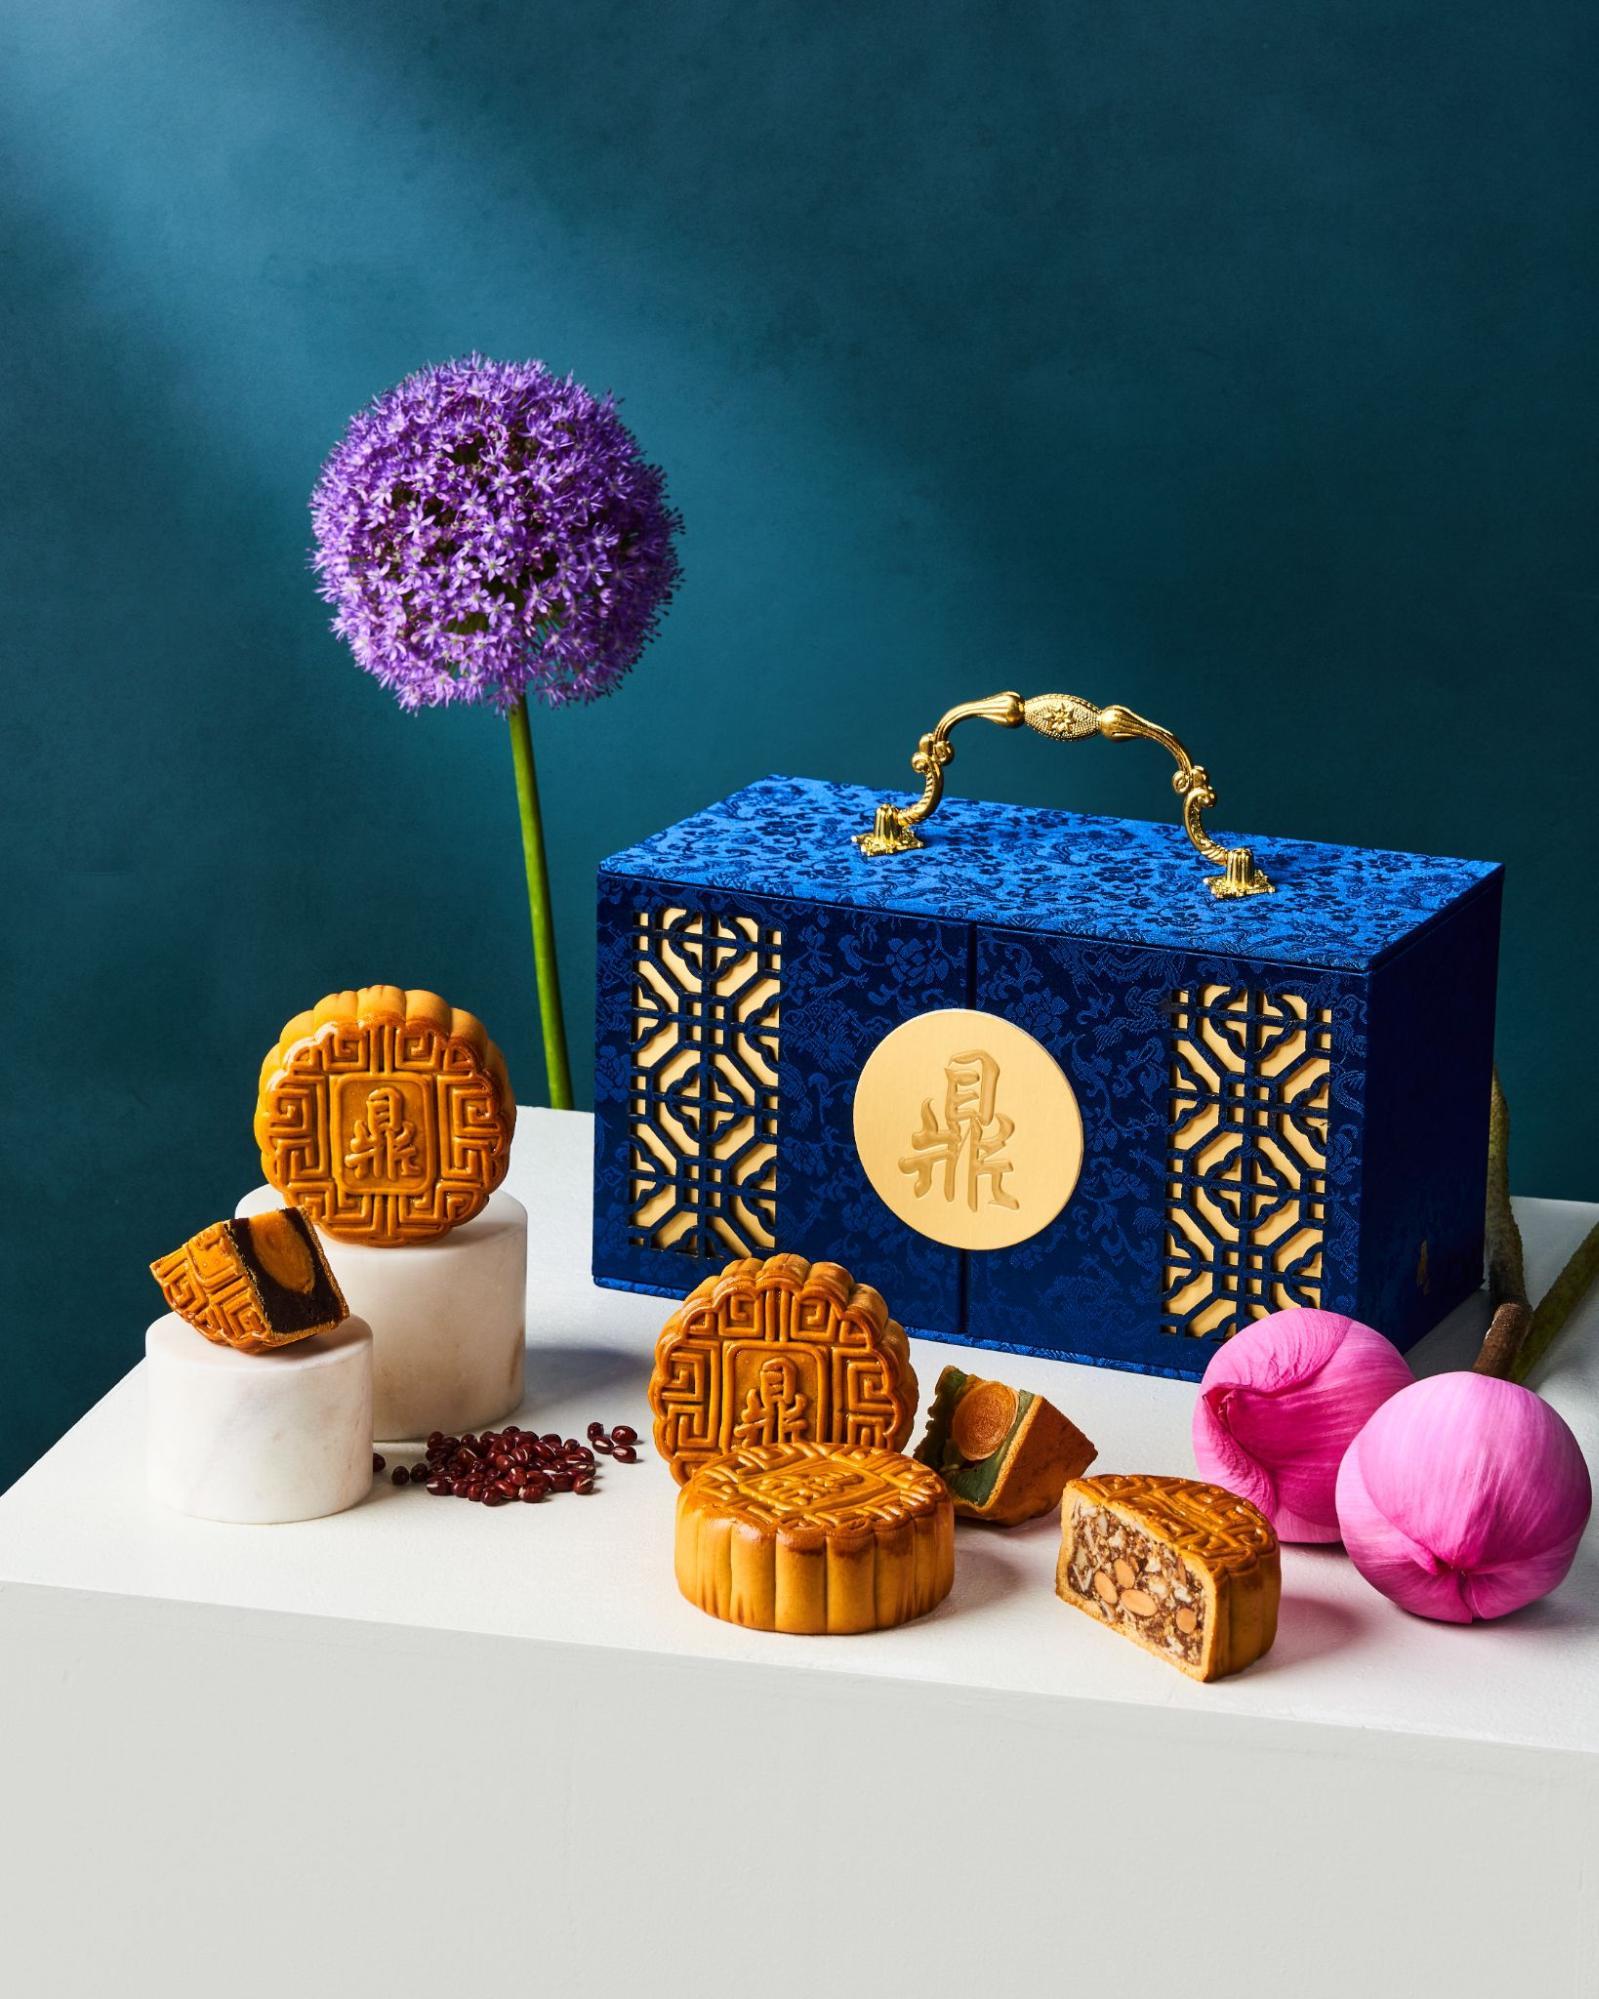 Mooncake Boxes 2021 to Repurpose - Ding Mooncake Baked Mooncakes